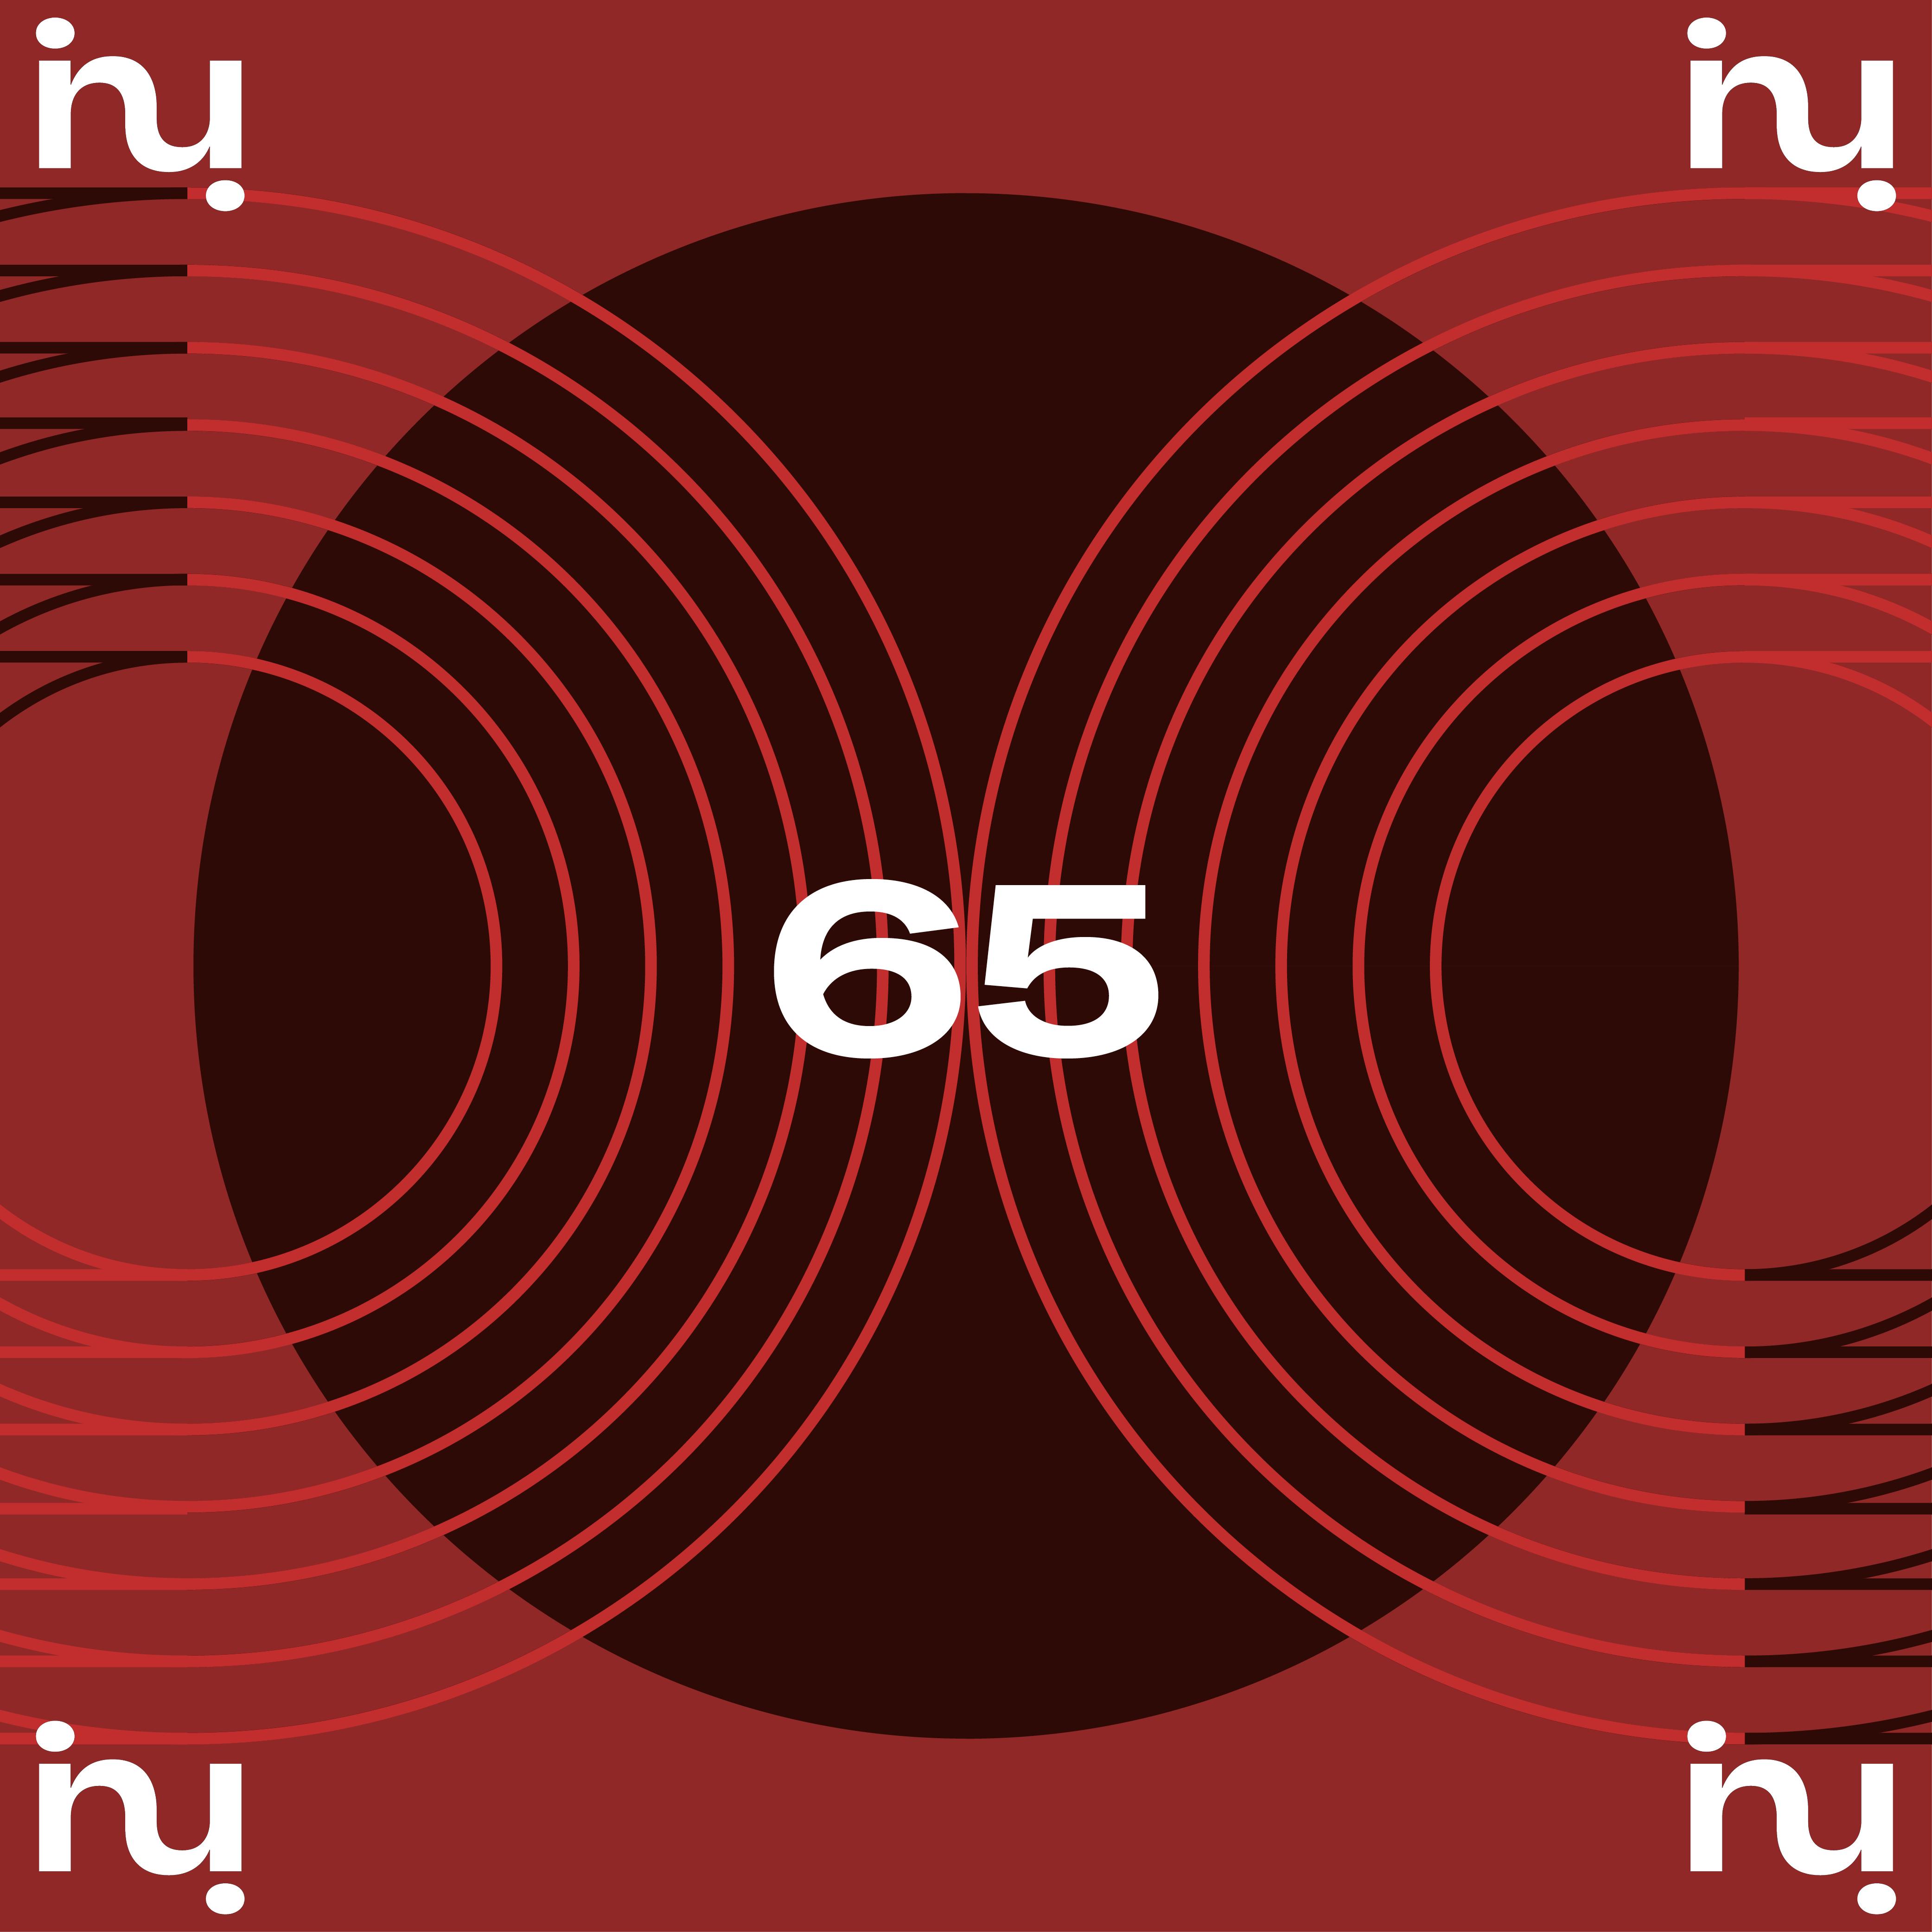 LISTENUP_PLAYLIST #65